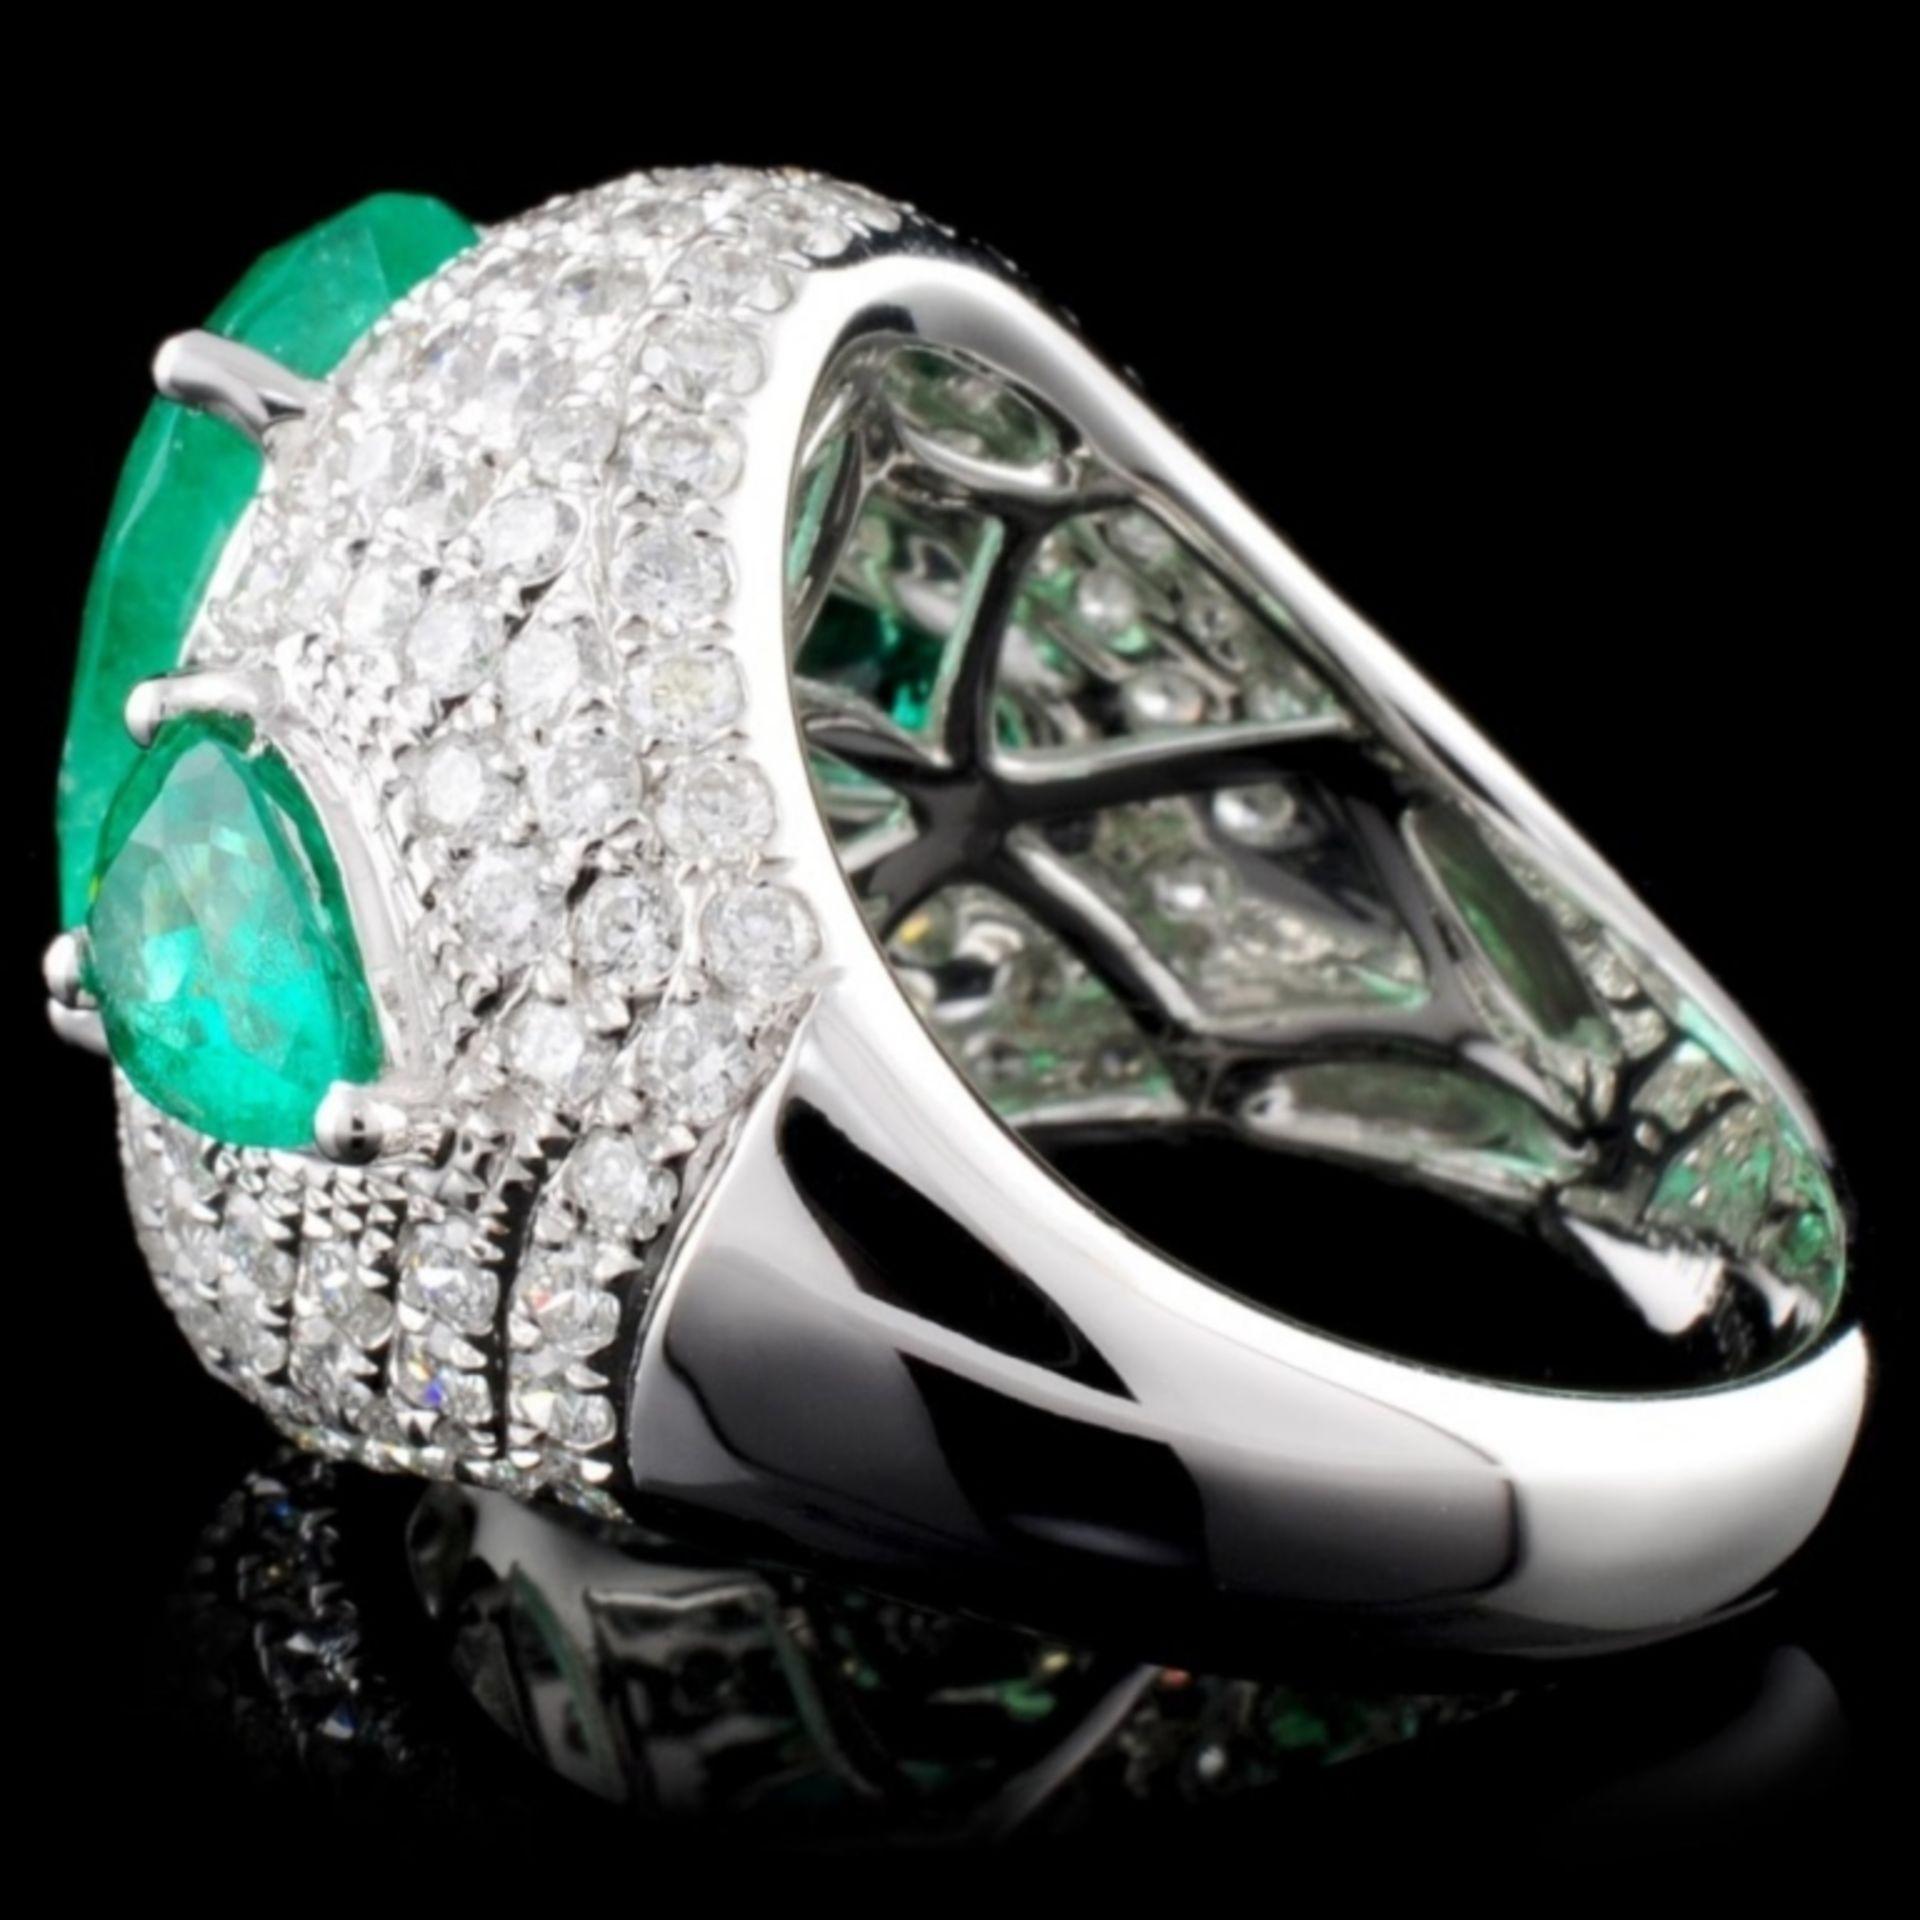 18K Gold 5.07ct Emerald & 2.52ct Diamond Ring - Image 3 of 4